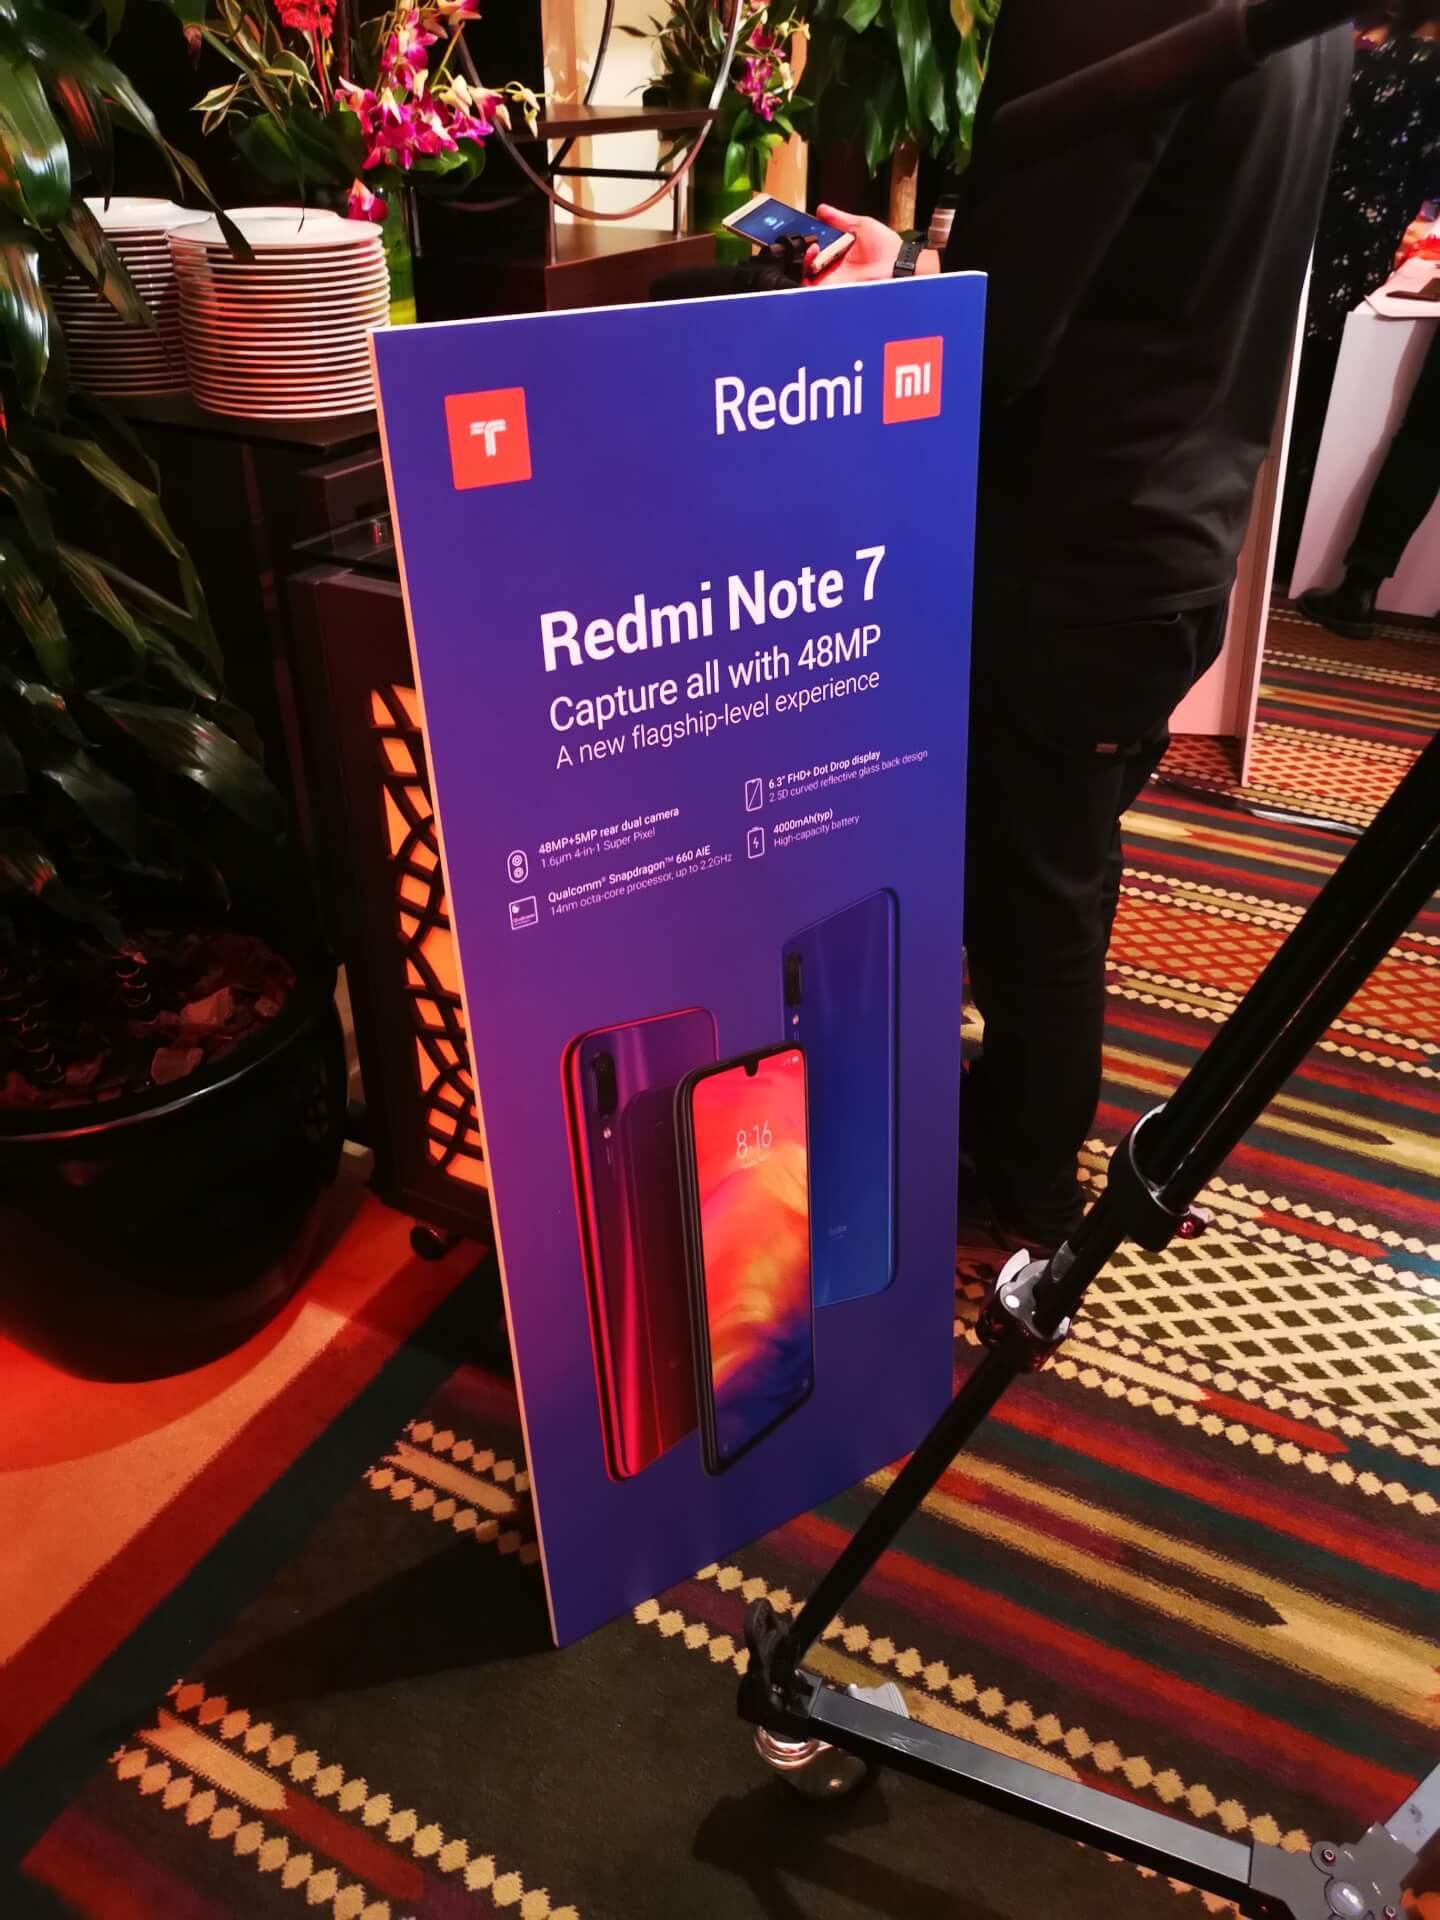 سعر ومواصفات هاتف Redmi Note 7 الجديد